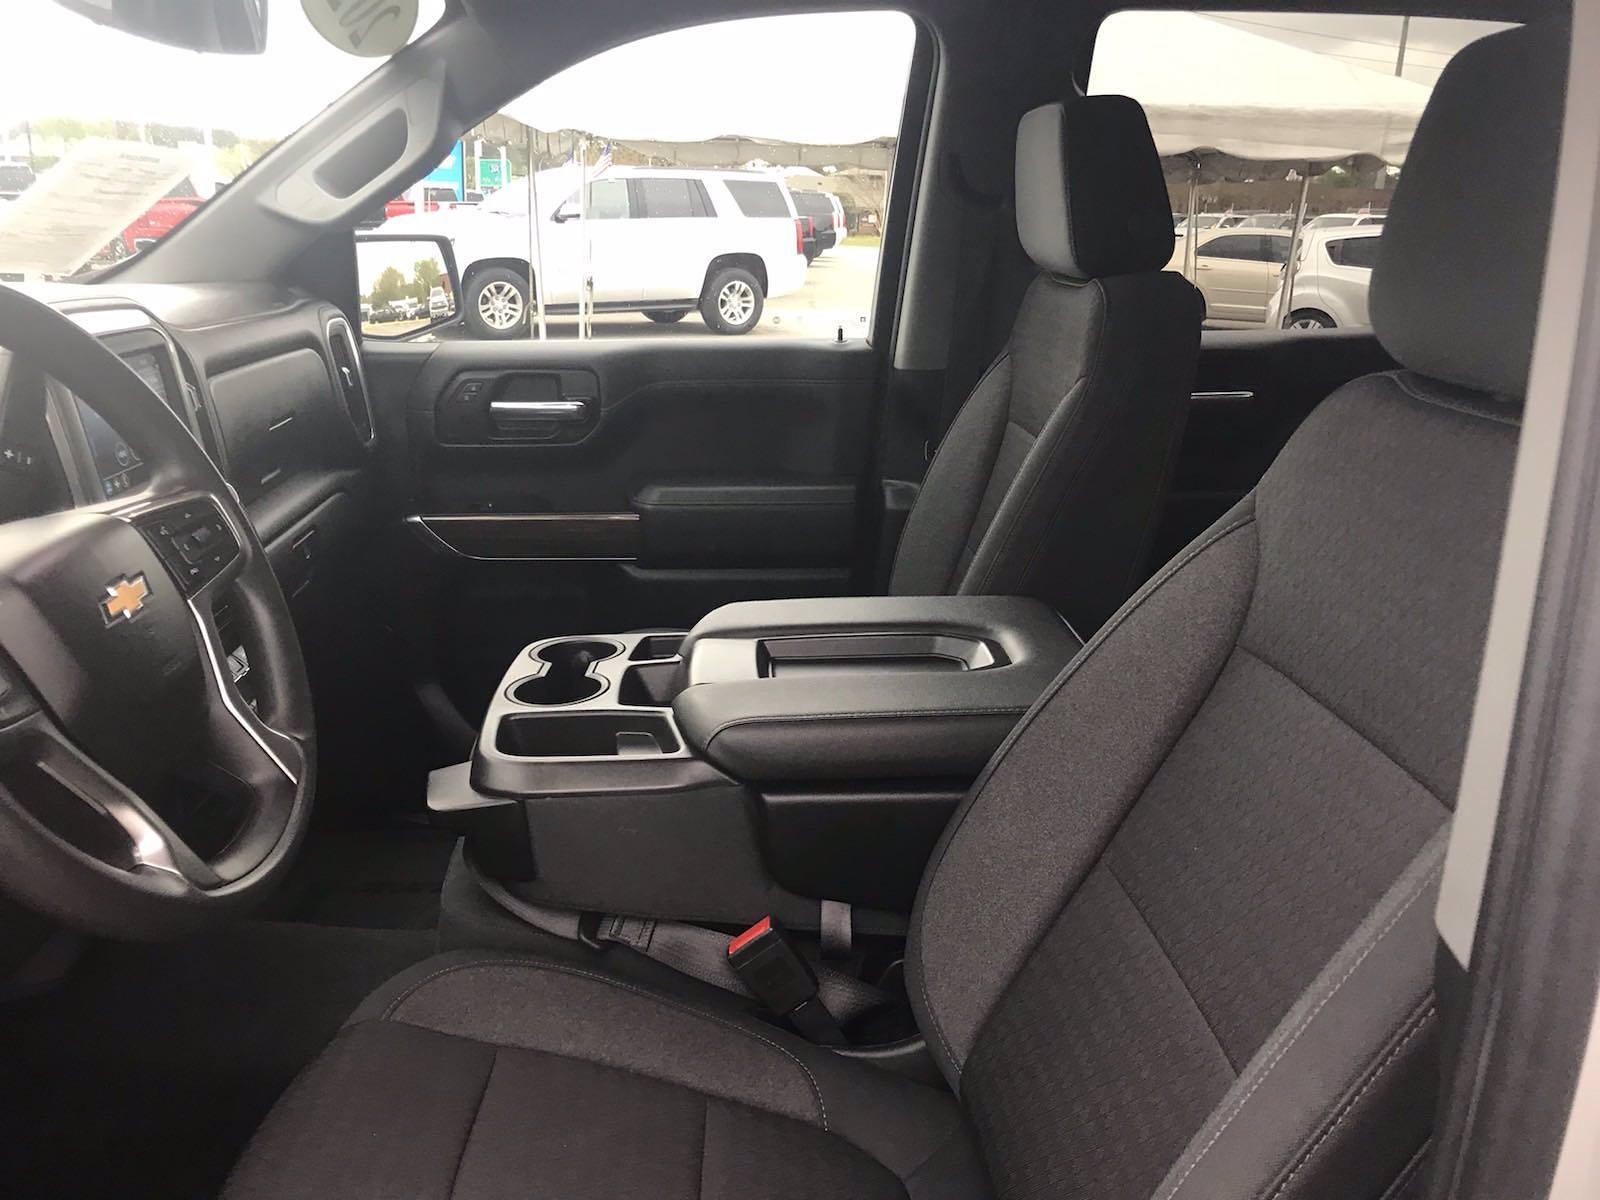 2020 Chevrolet Silverado 1500 Crew Cab 4x4, Pickup #16468P - photo 22